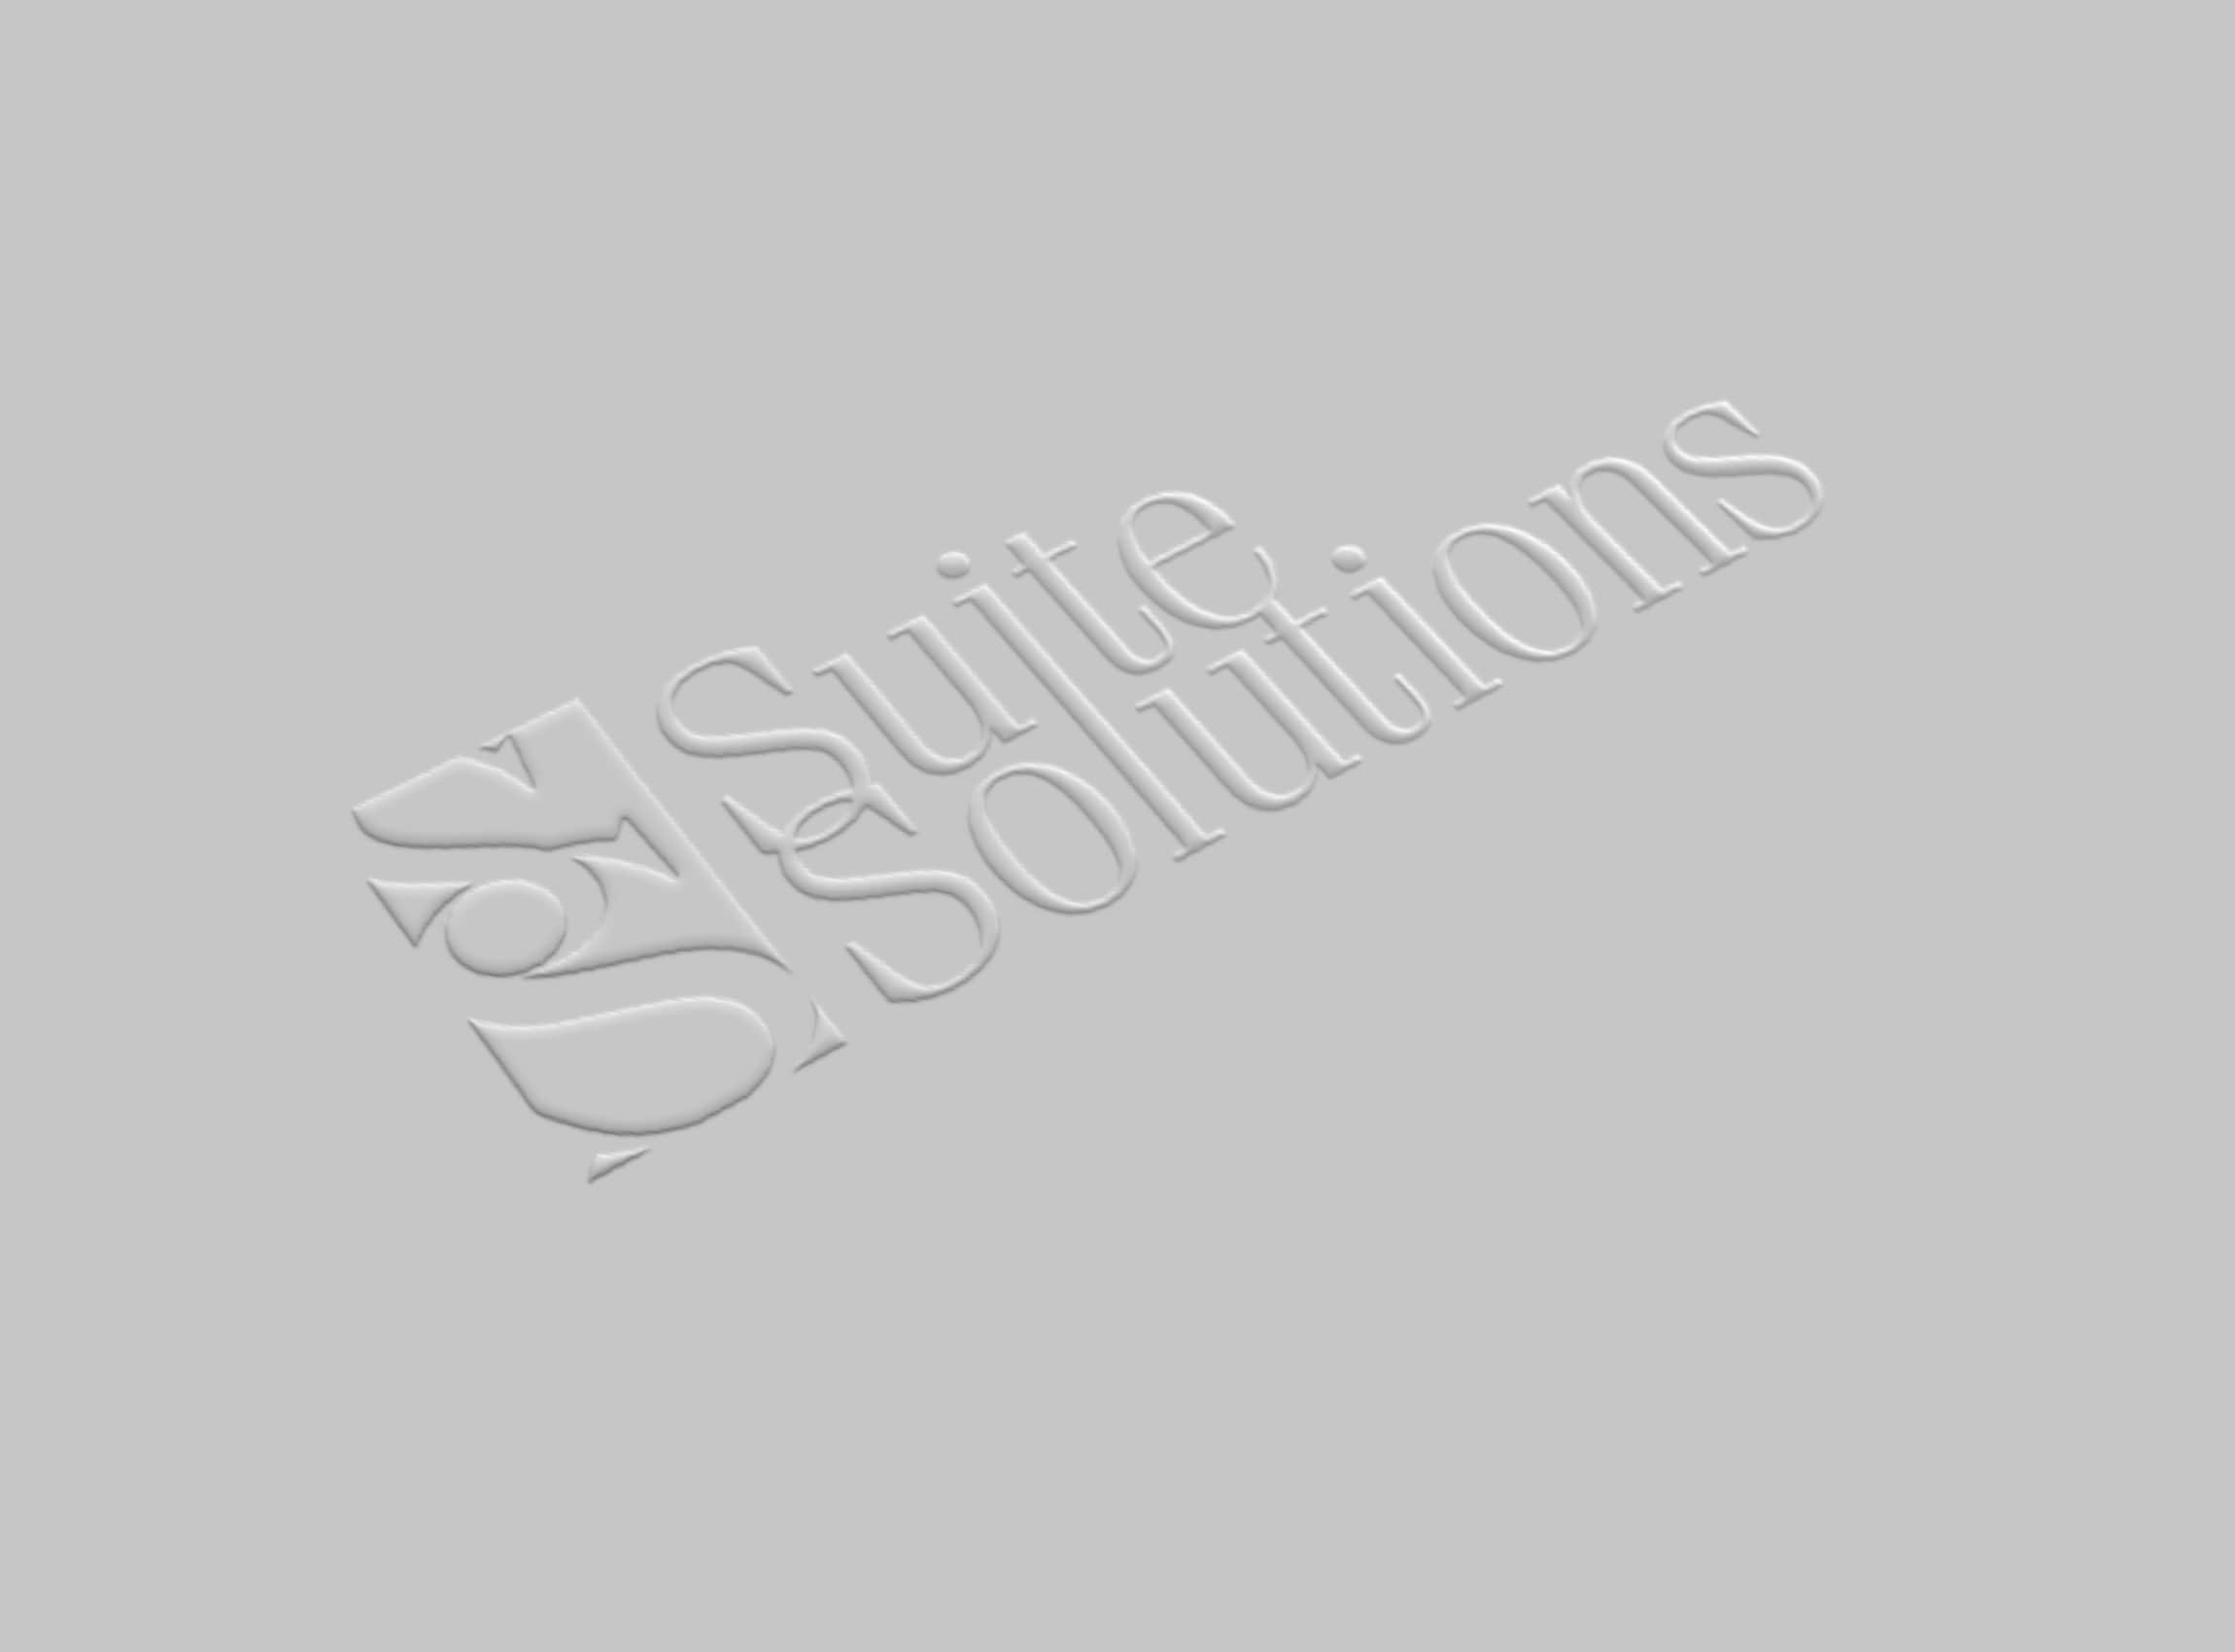 Suite Solutions